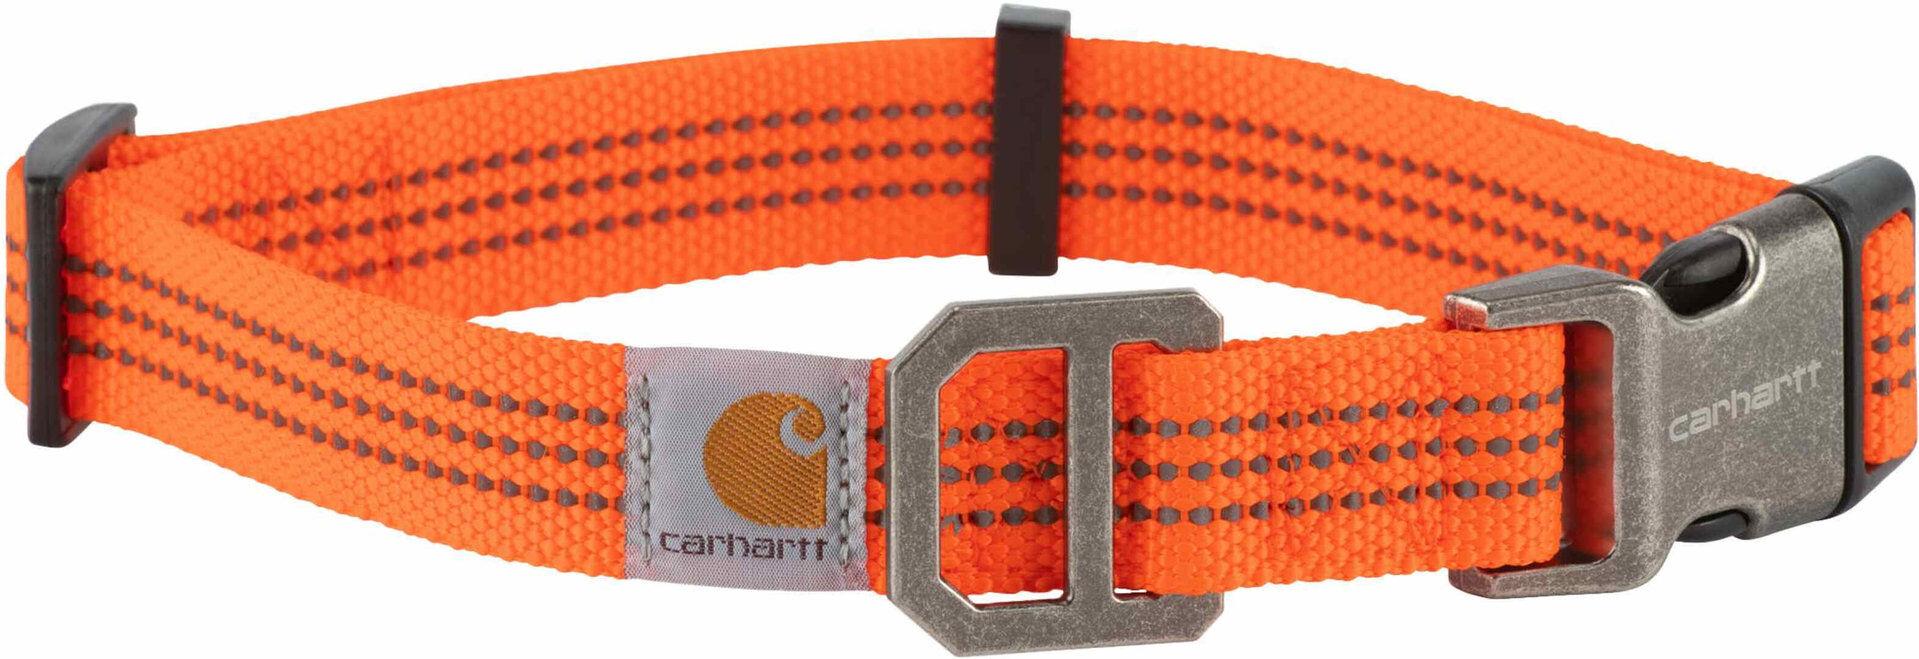 Carhartt Tradesman Collier de chien Orange taille : M